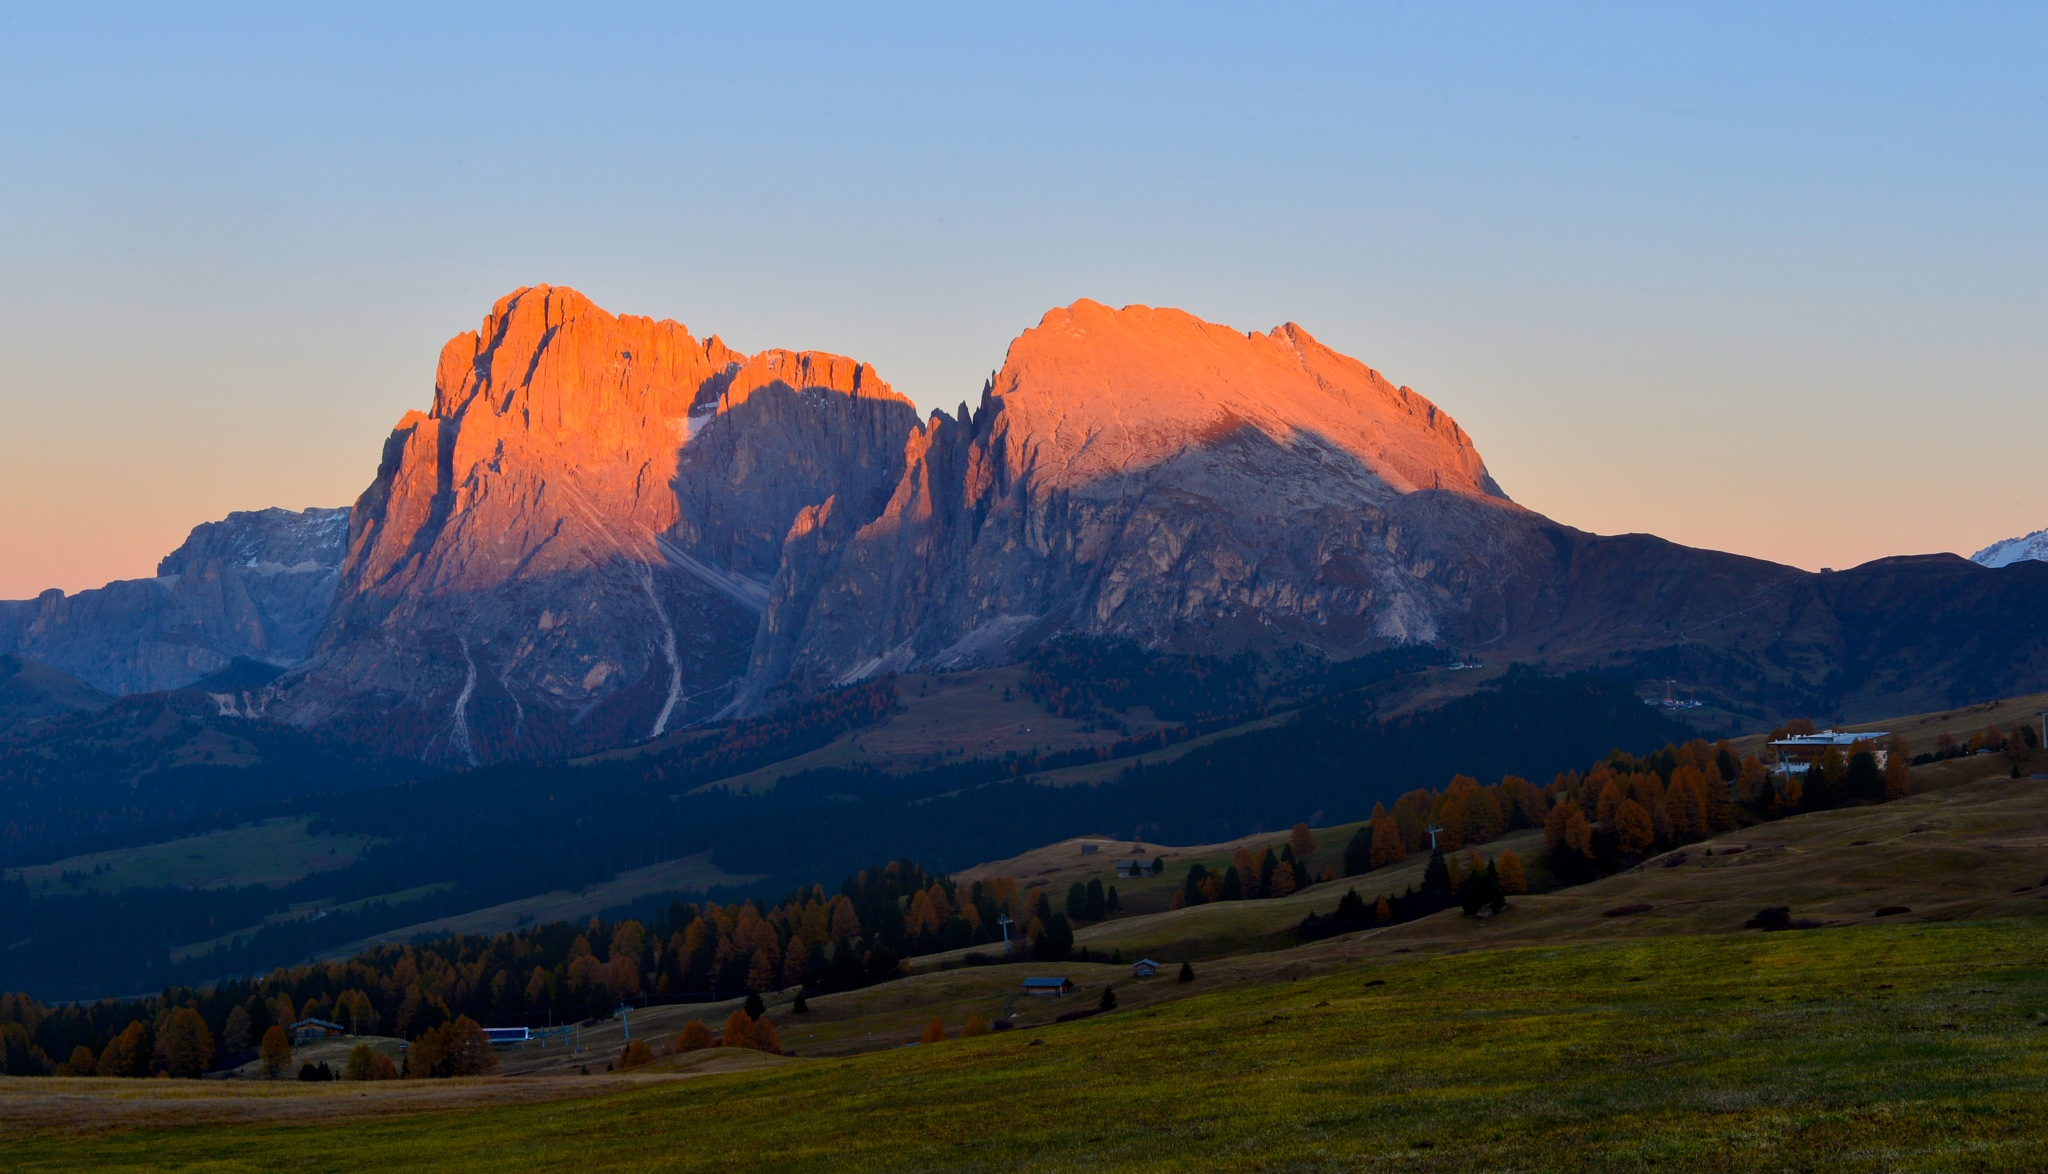 burning peaks by maurizio senoner